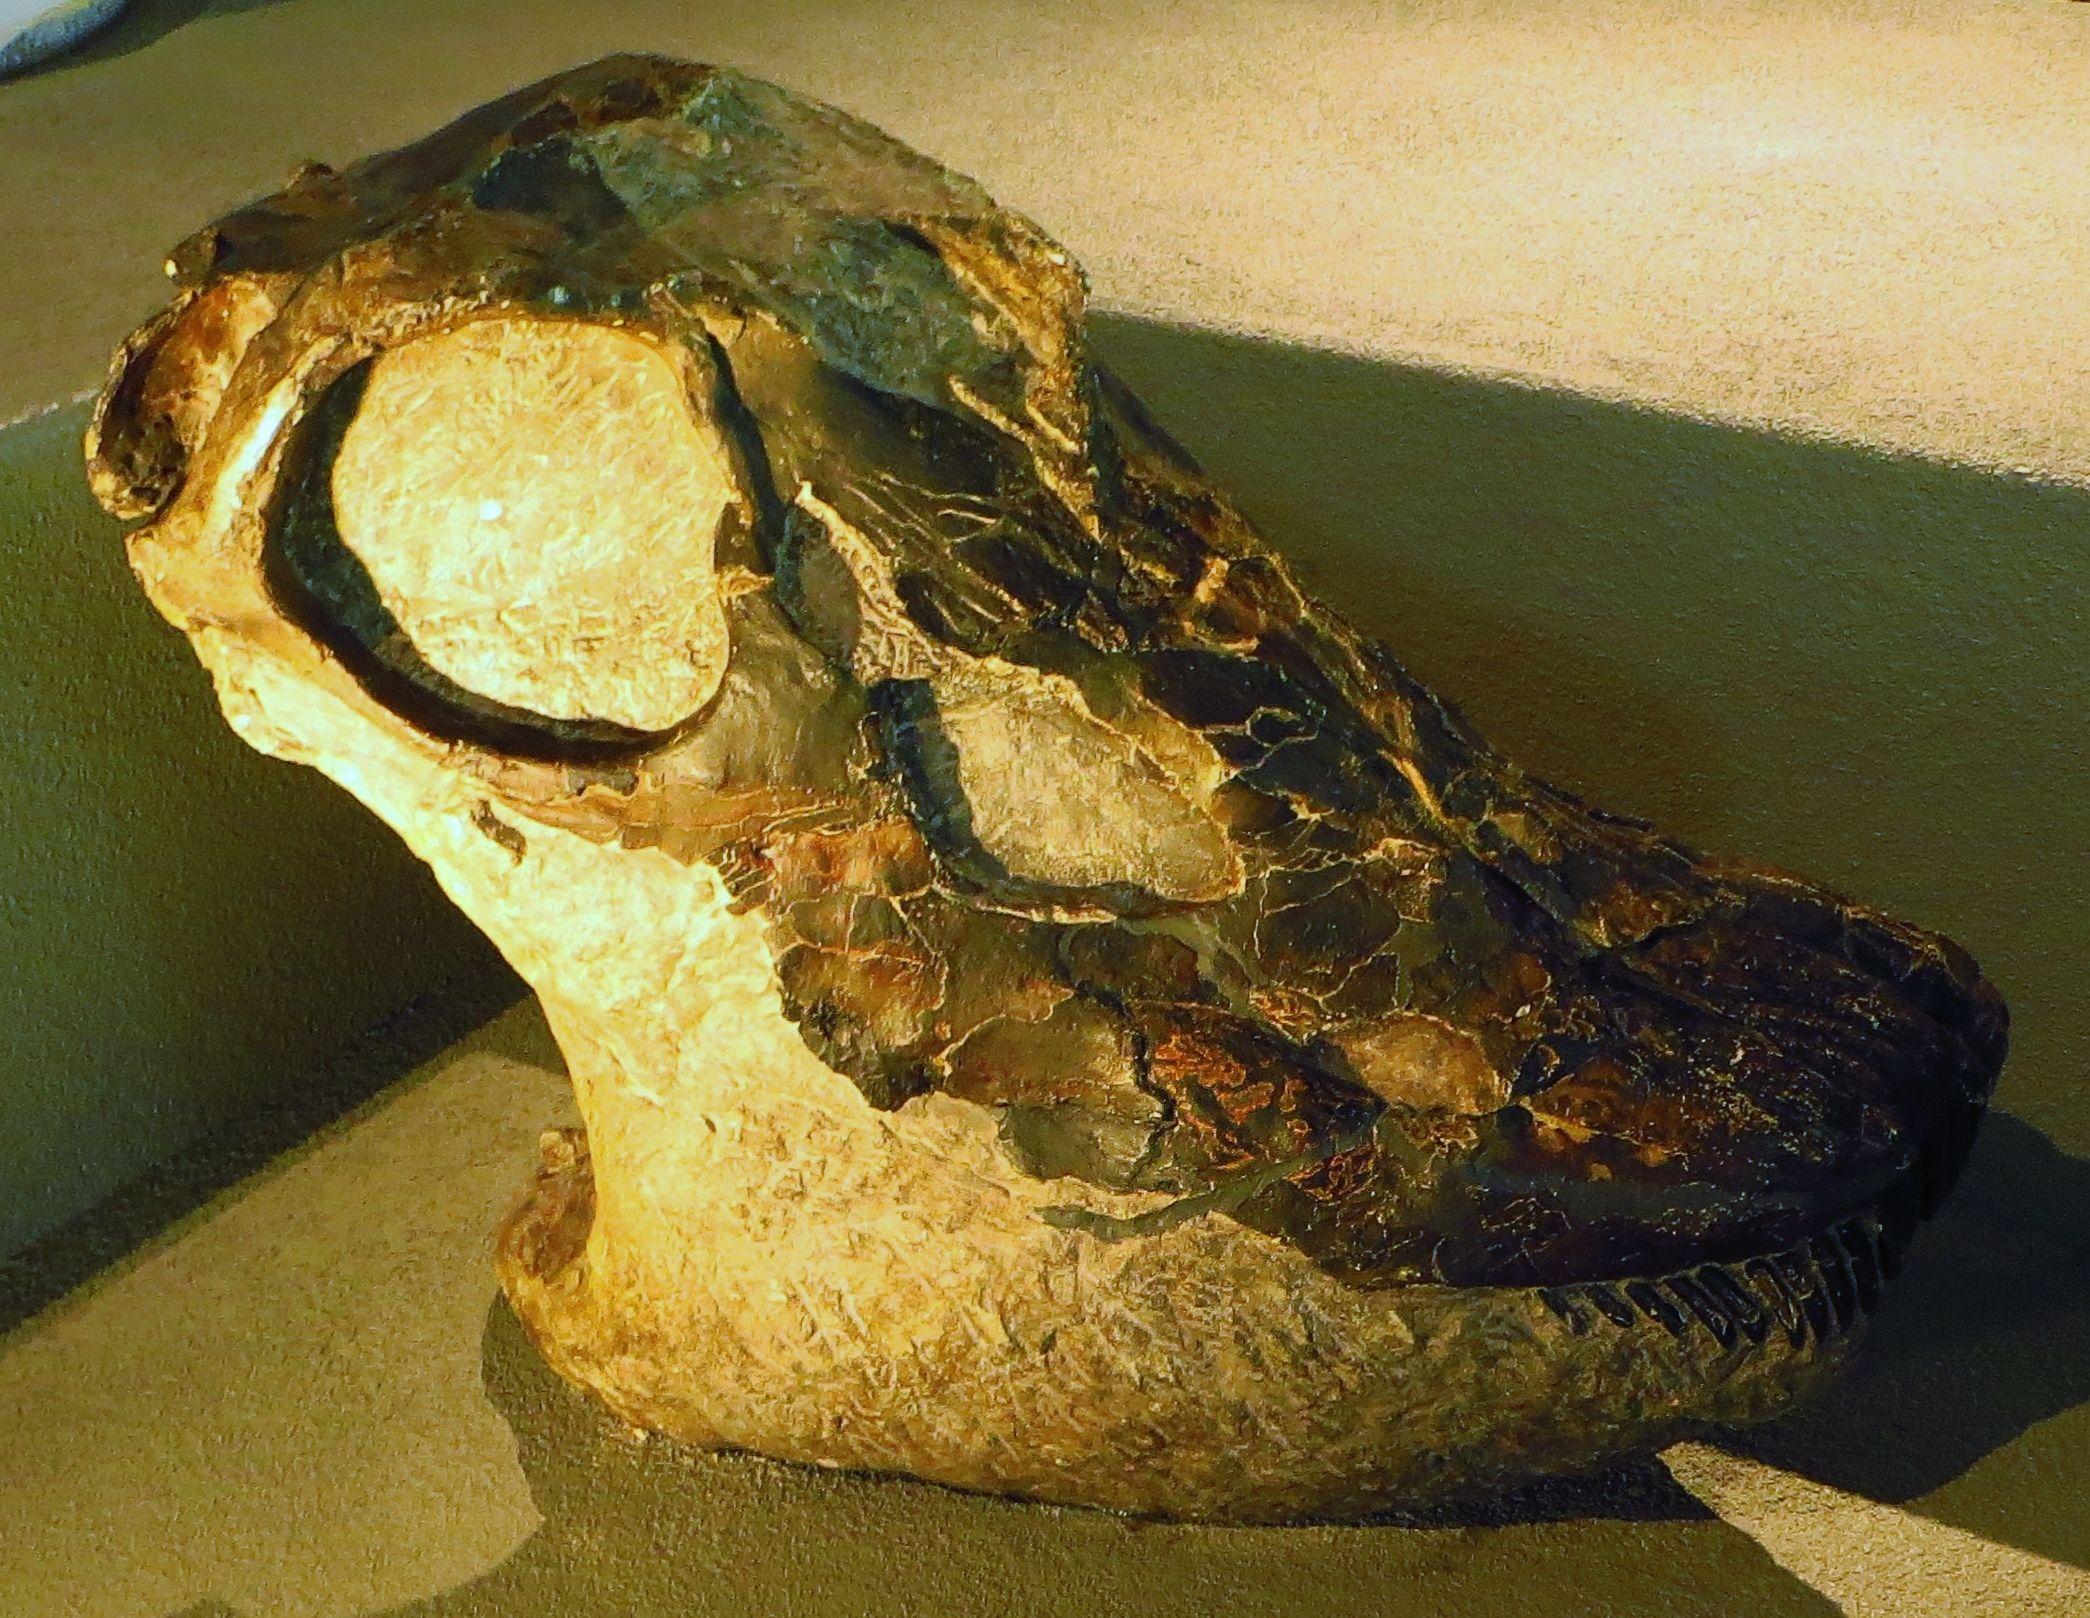 Crâne de Diplodocus sp. Naturalis, Leiden. Dinosauria ...